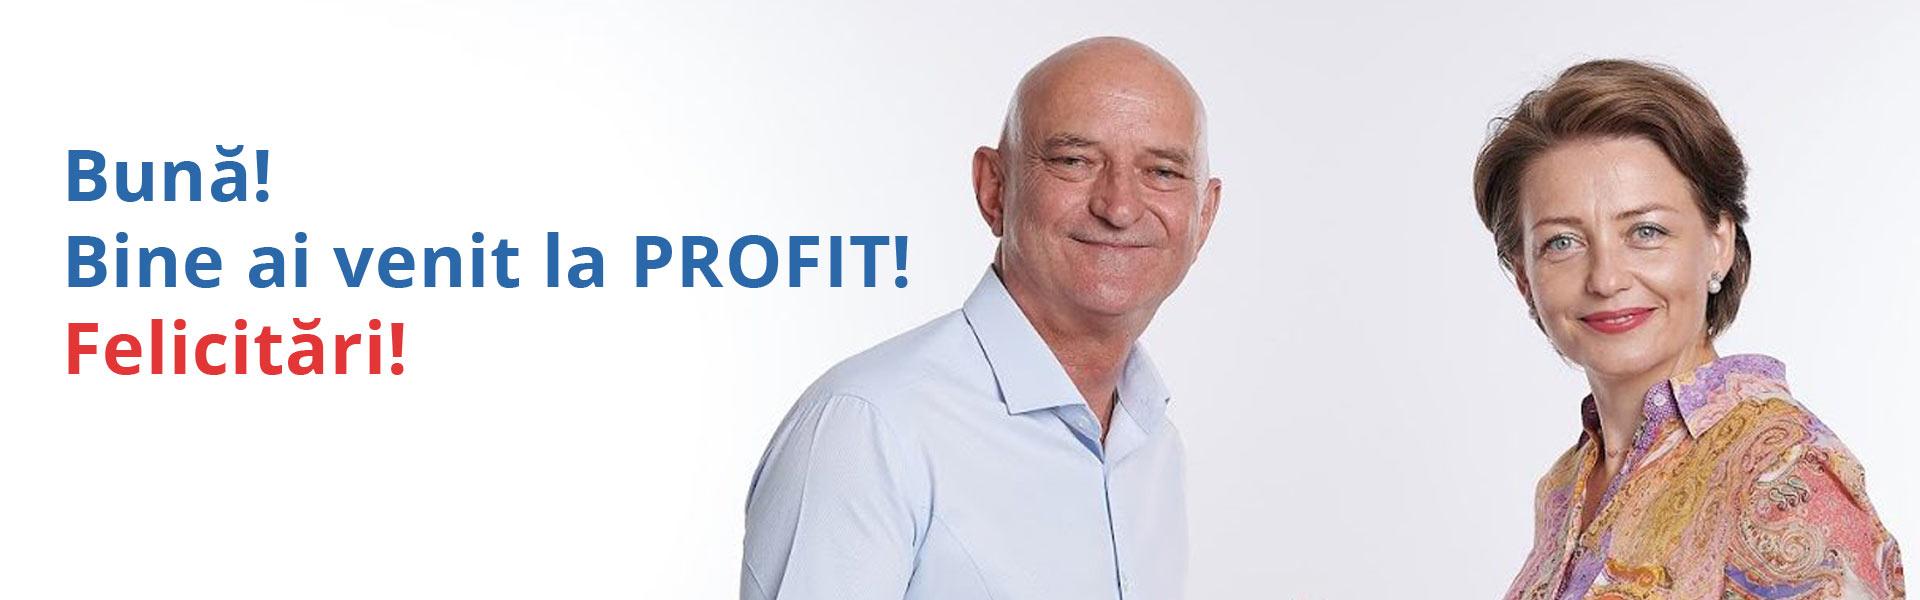 ProfitByLeadership